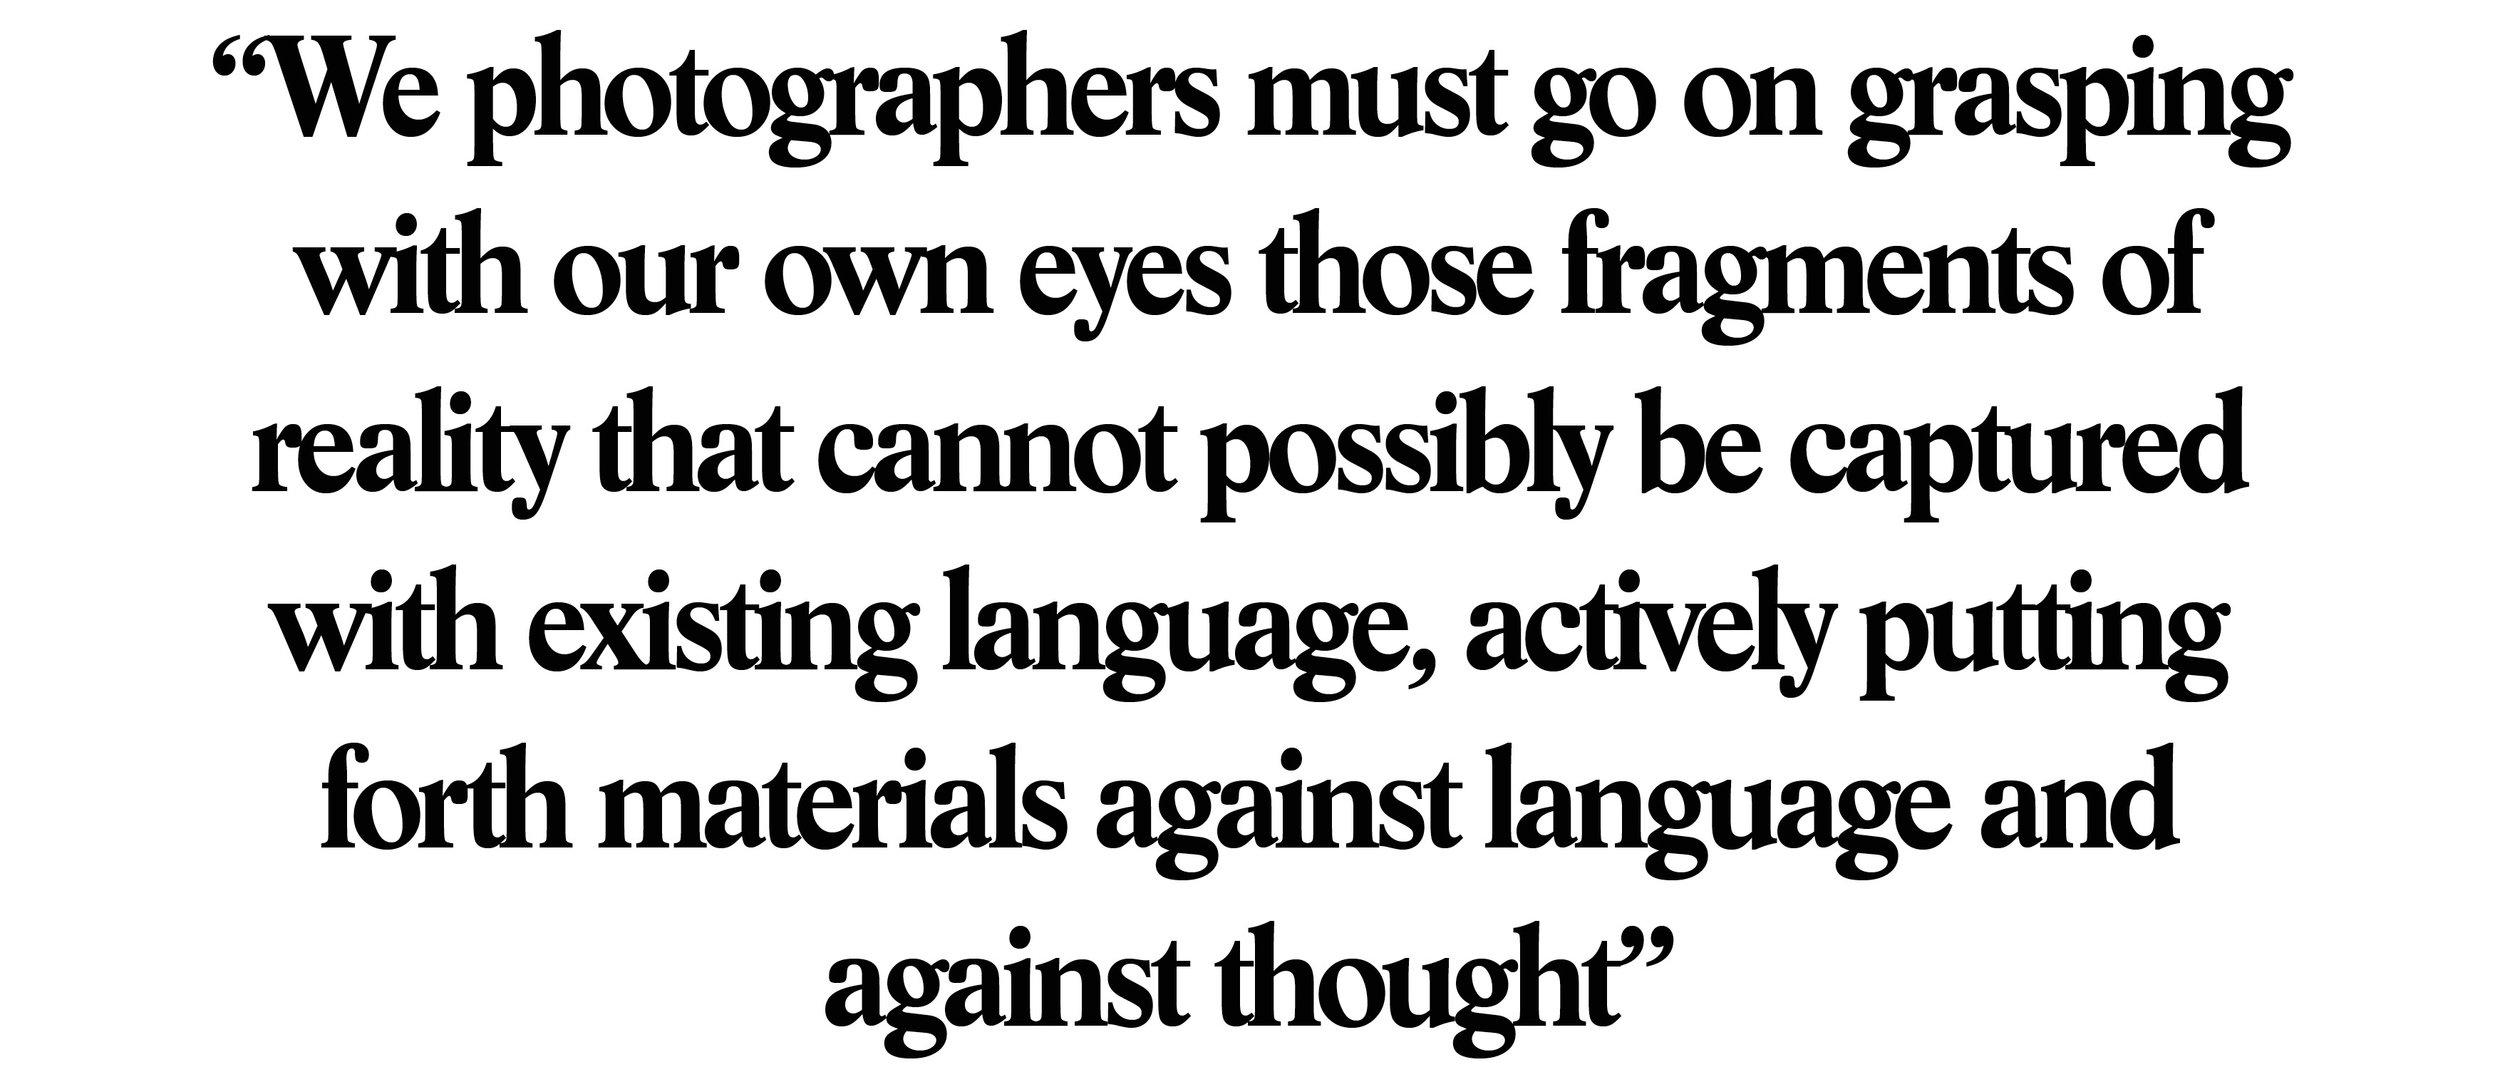 provoke-quote-new.jpg